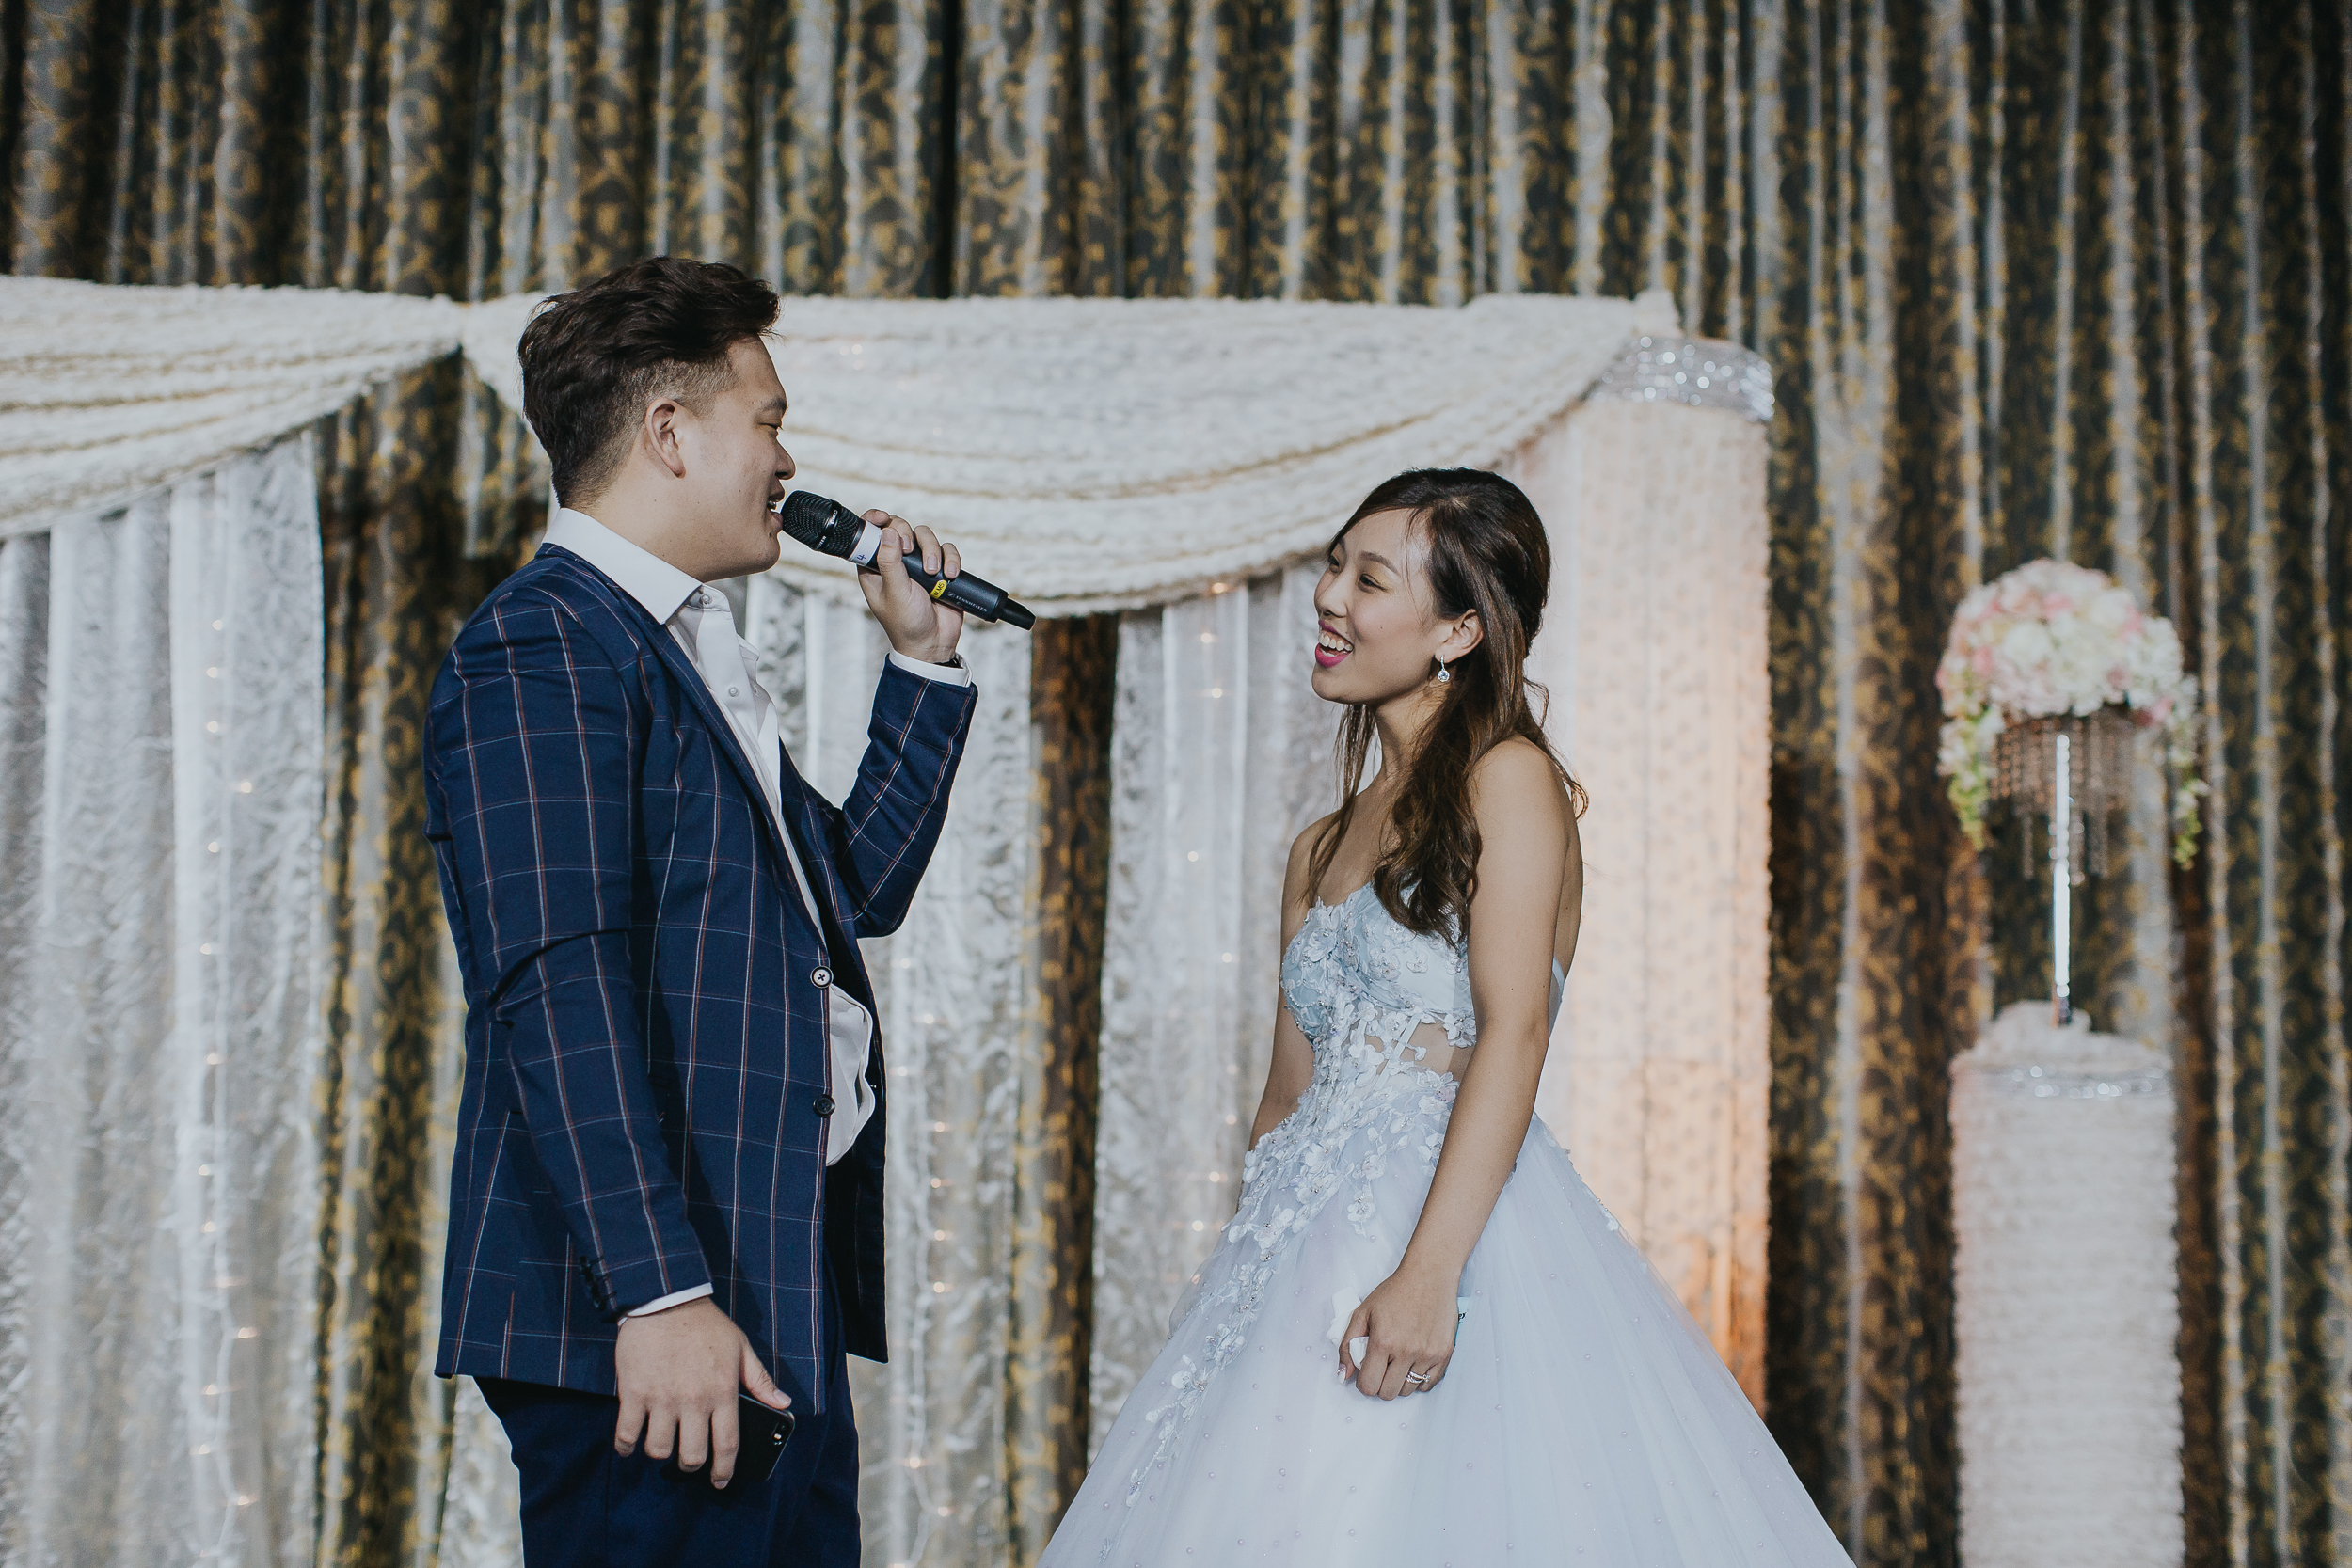 Singapore+Actual+Day+Wedding+Photographer+Grand+Mercure+Oliver+Estelle-0115.jpg